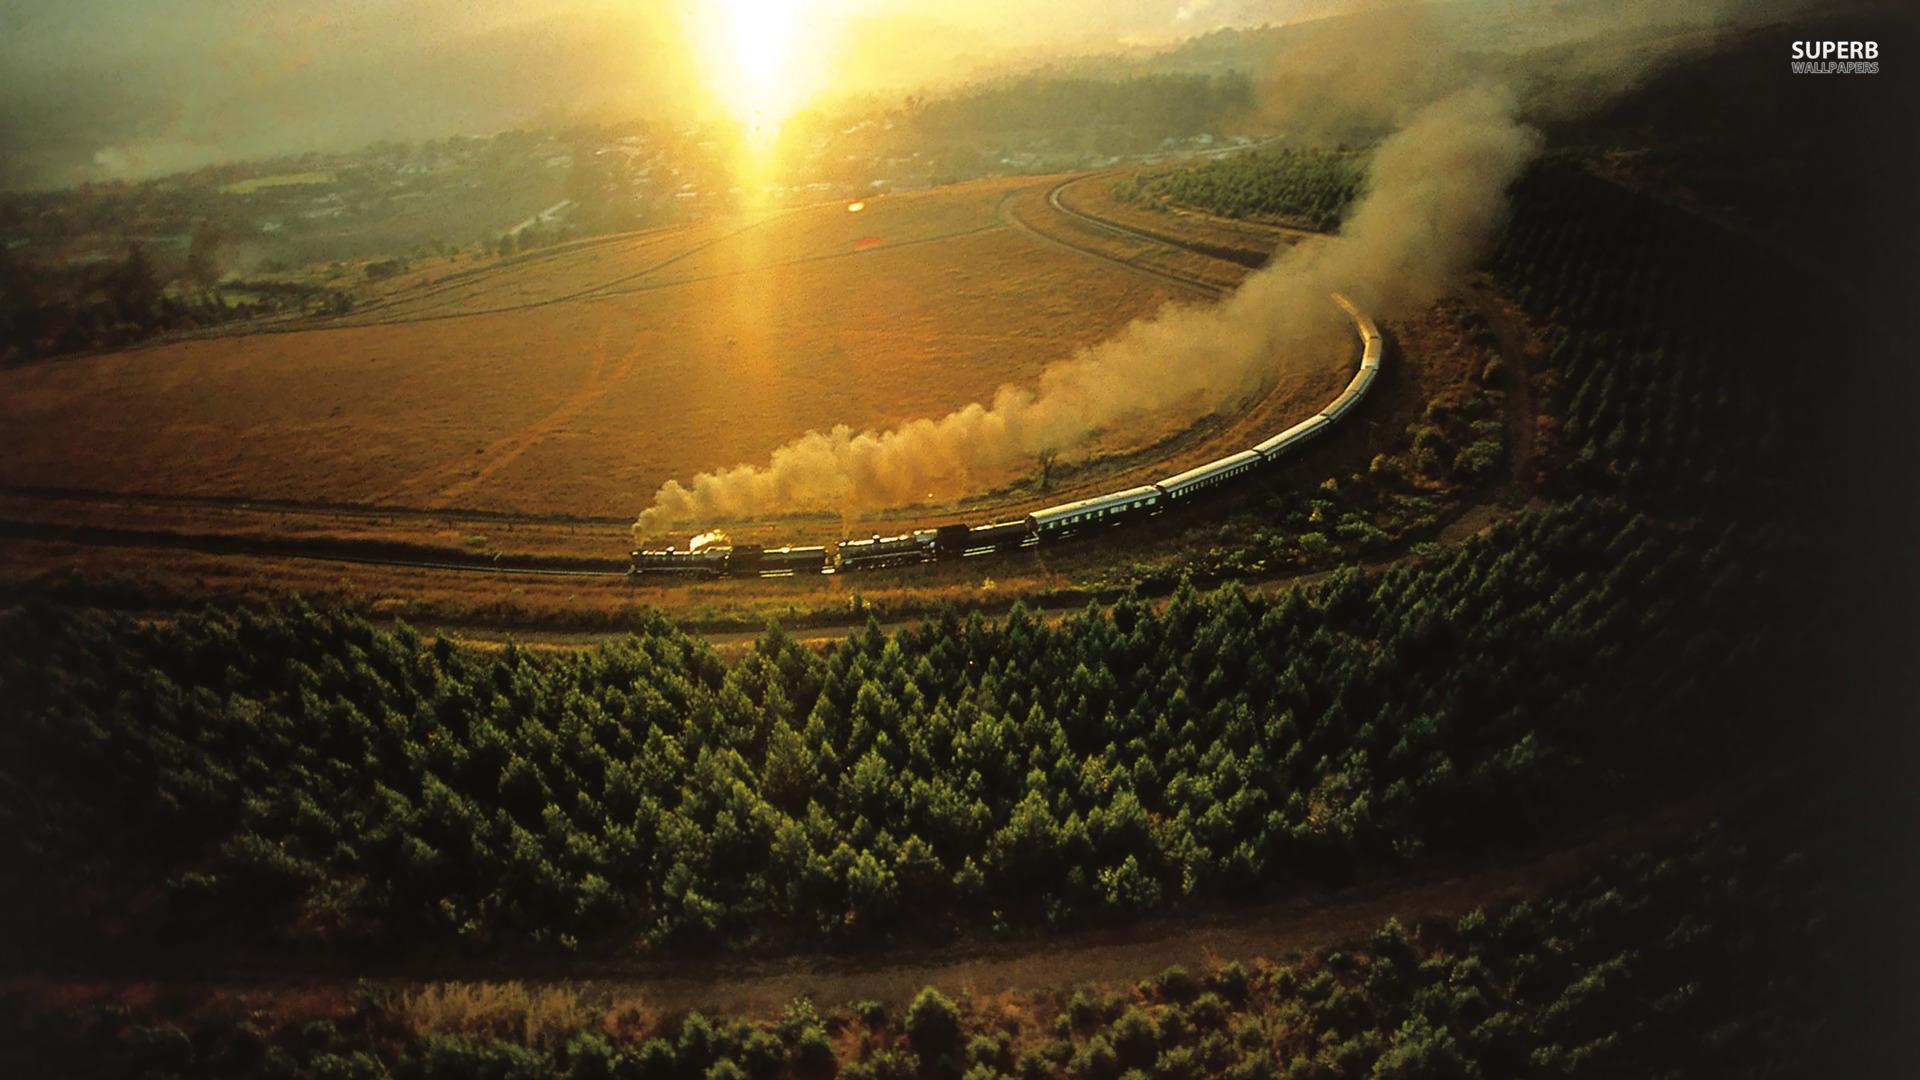 rovos-rail-23334-1920x1080